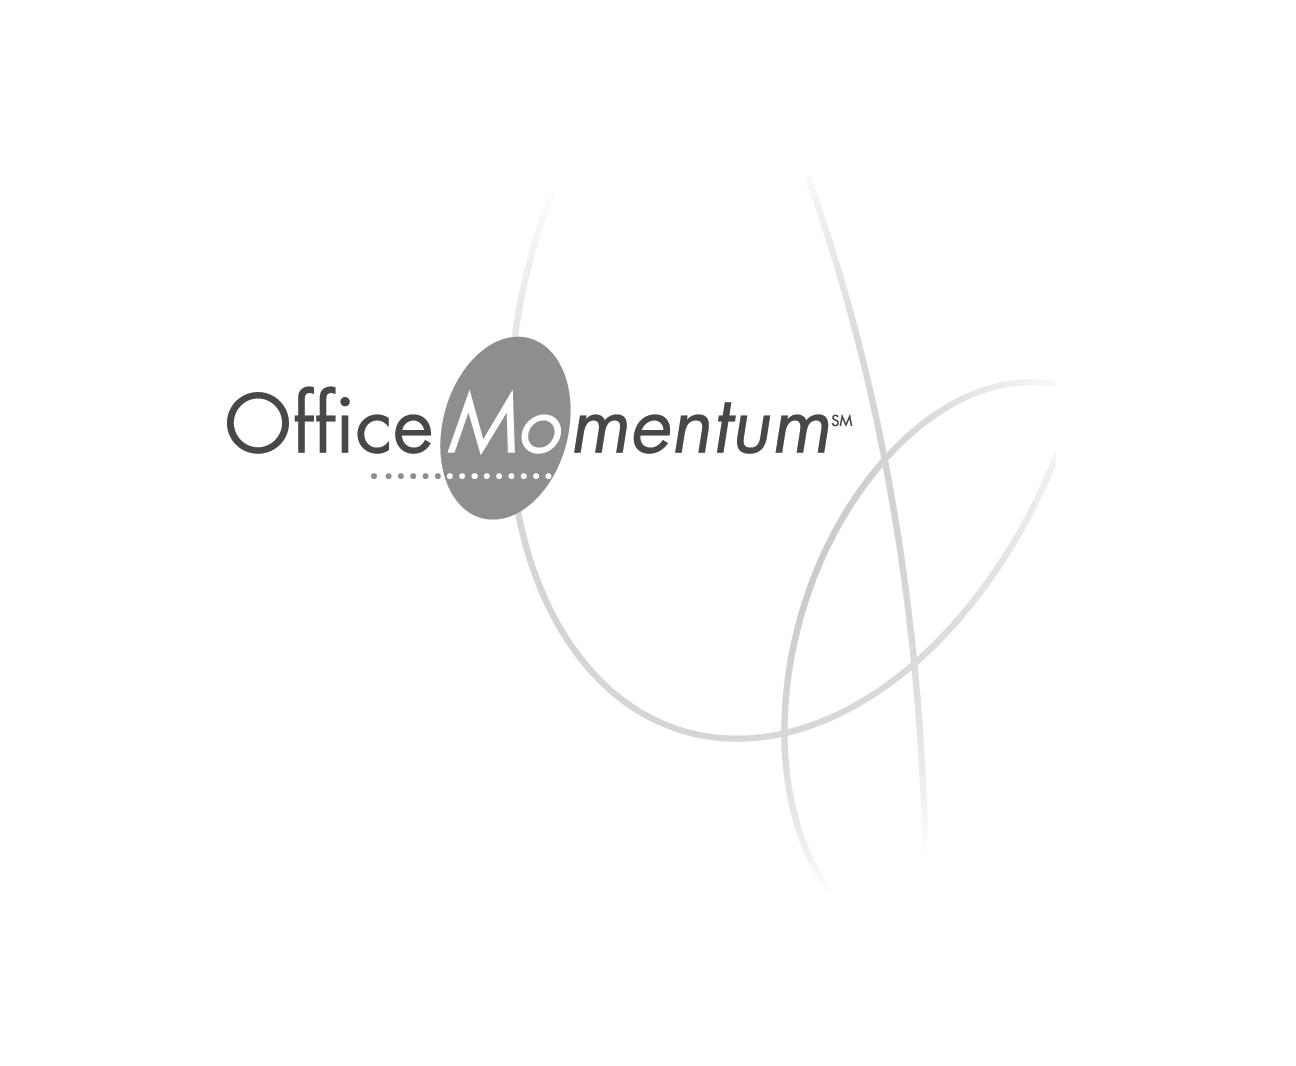 logo_office_momentum_gs.jpg